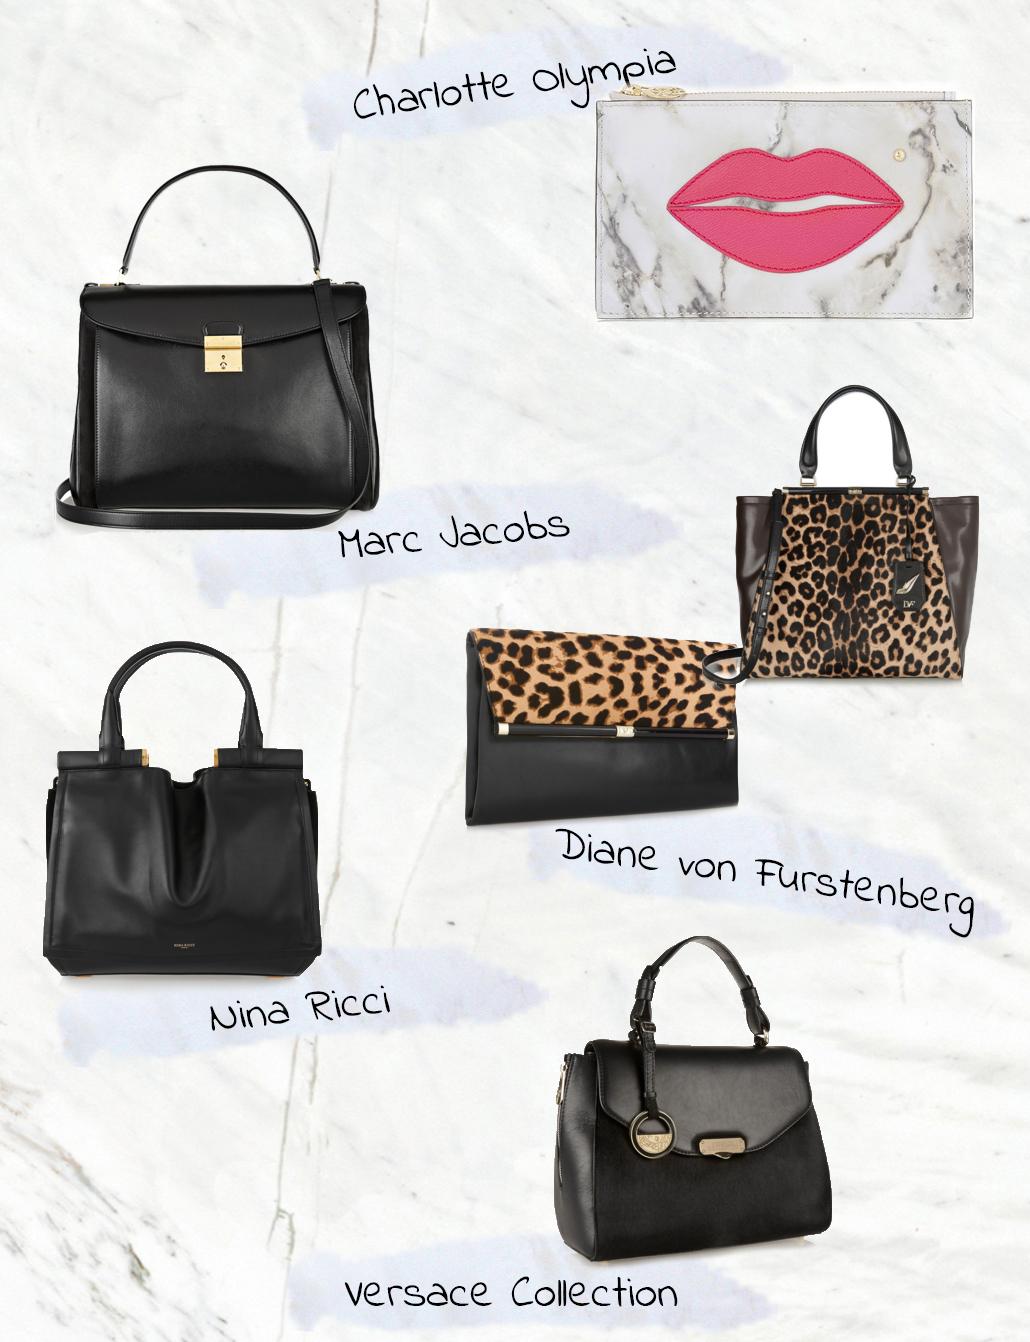 Designer bag wishlist The Outnet Net-A-Porter